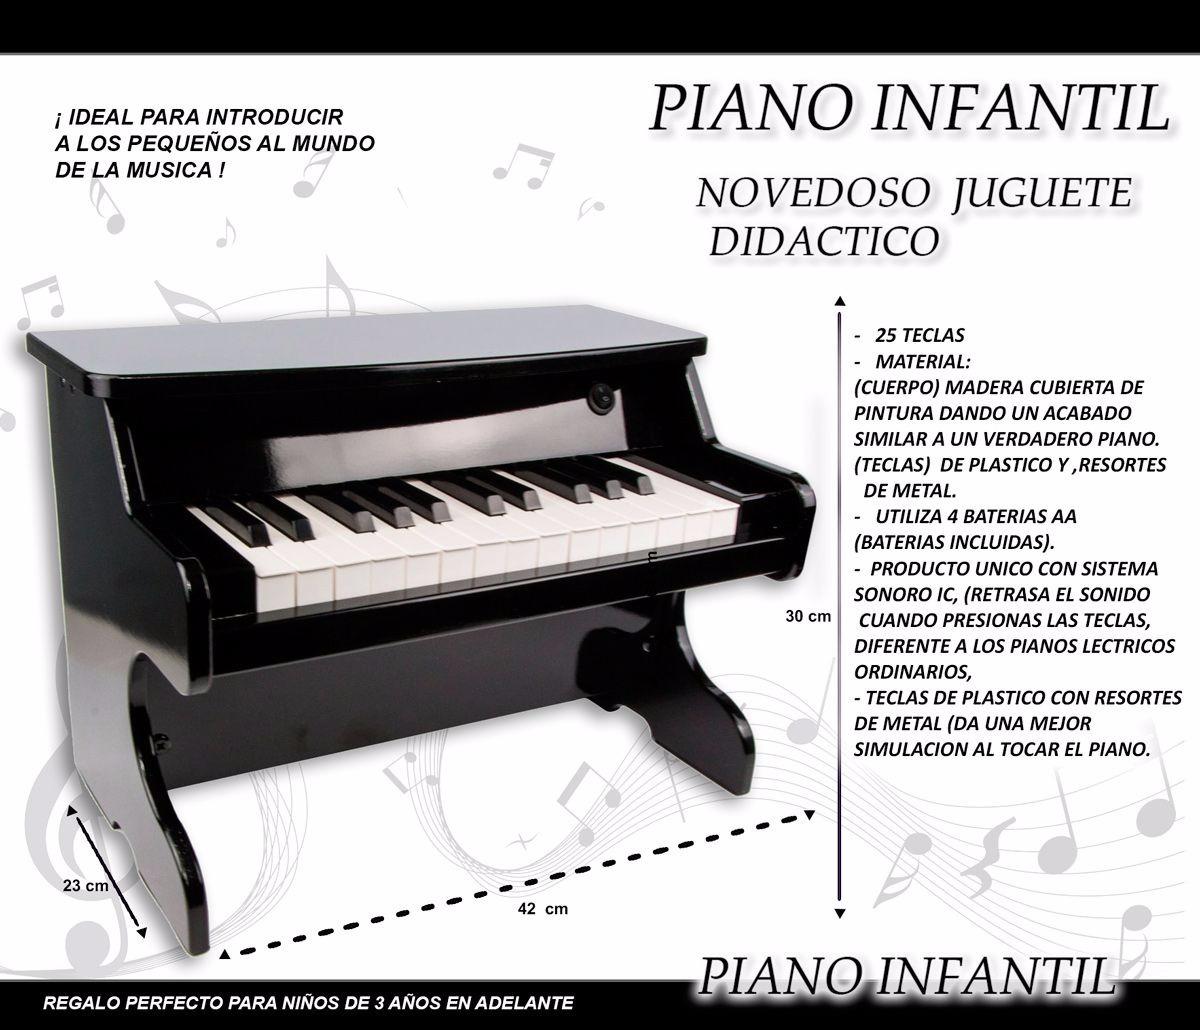 Niños Regalo Madera Juguetes 999 Pk 00 Teclas 10611 Niñas Dhw9ei2 Piano EID29WHY